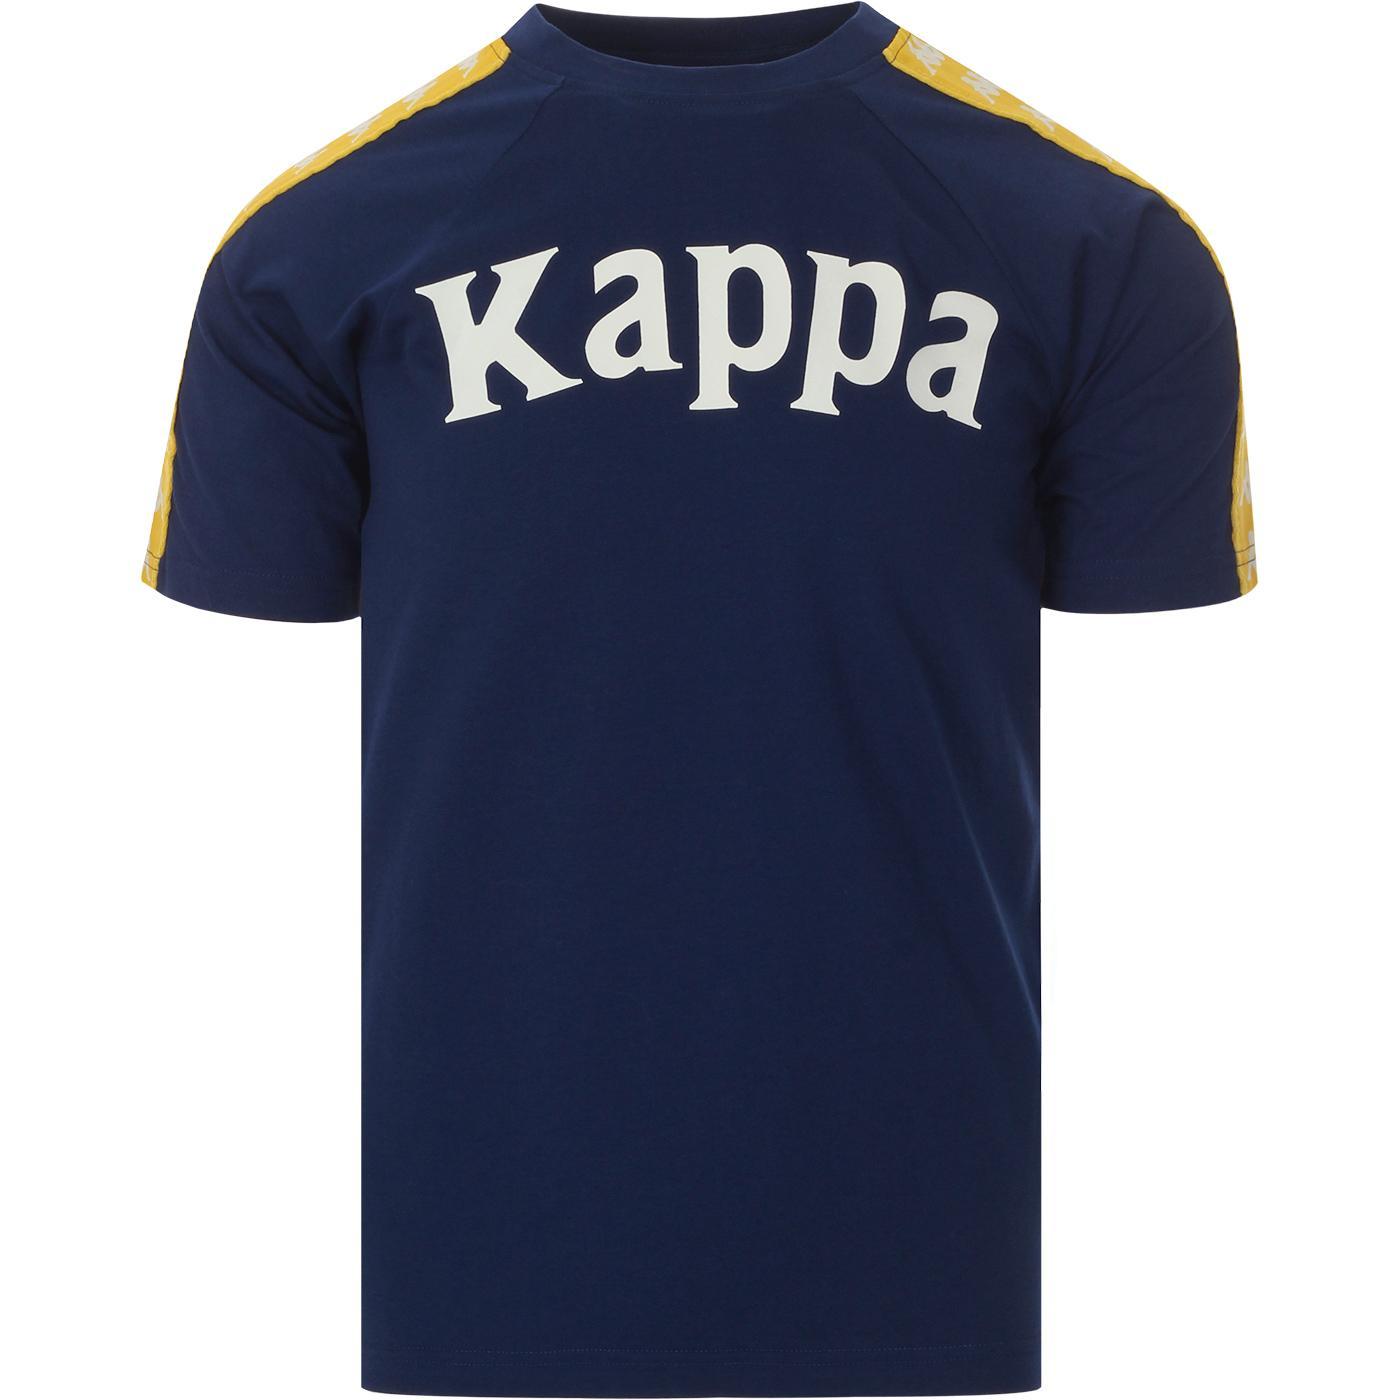 Balima KAPPA Mens Retro 90s Logo Tee (Blue/Yellow)